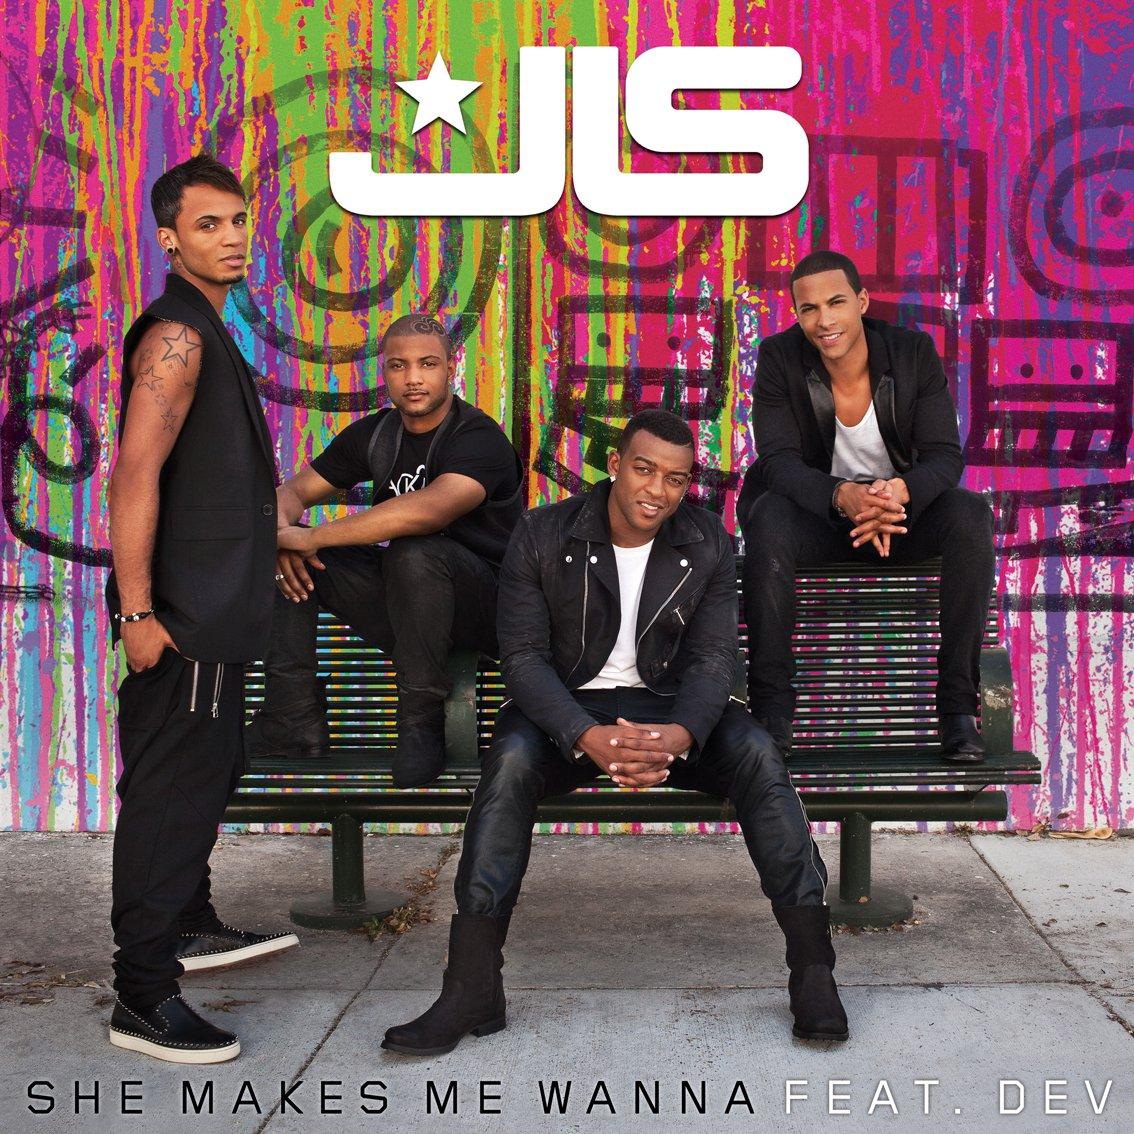 The Top Ten Songs   2014: JLS Official Top 10 Songs